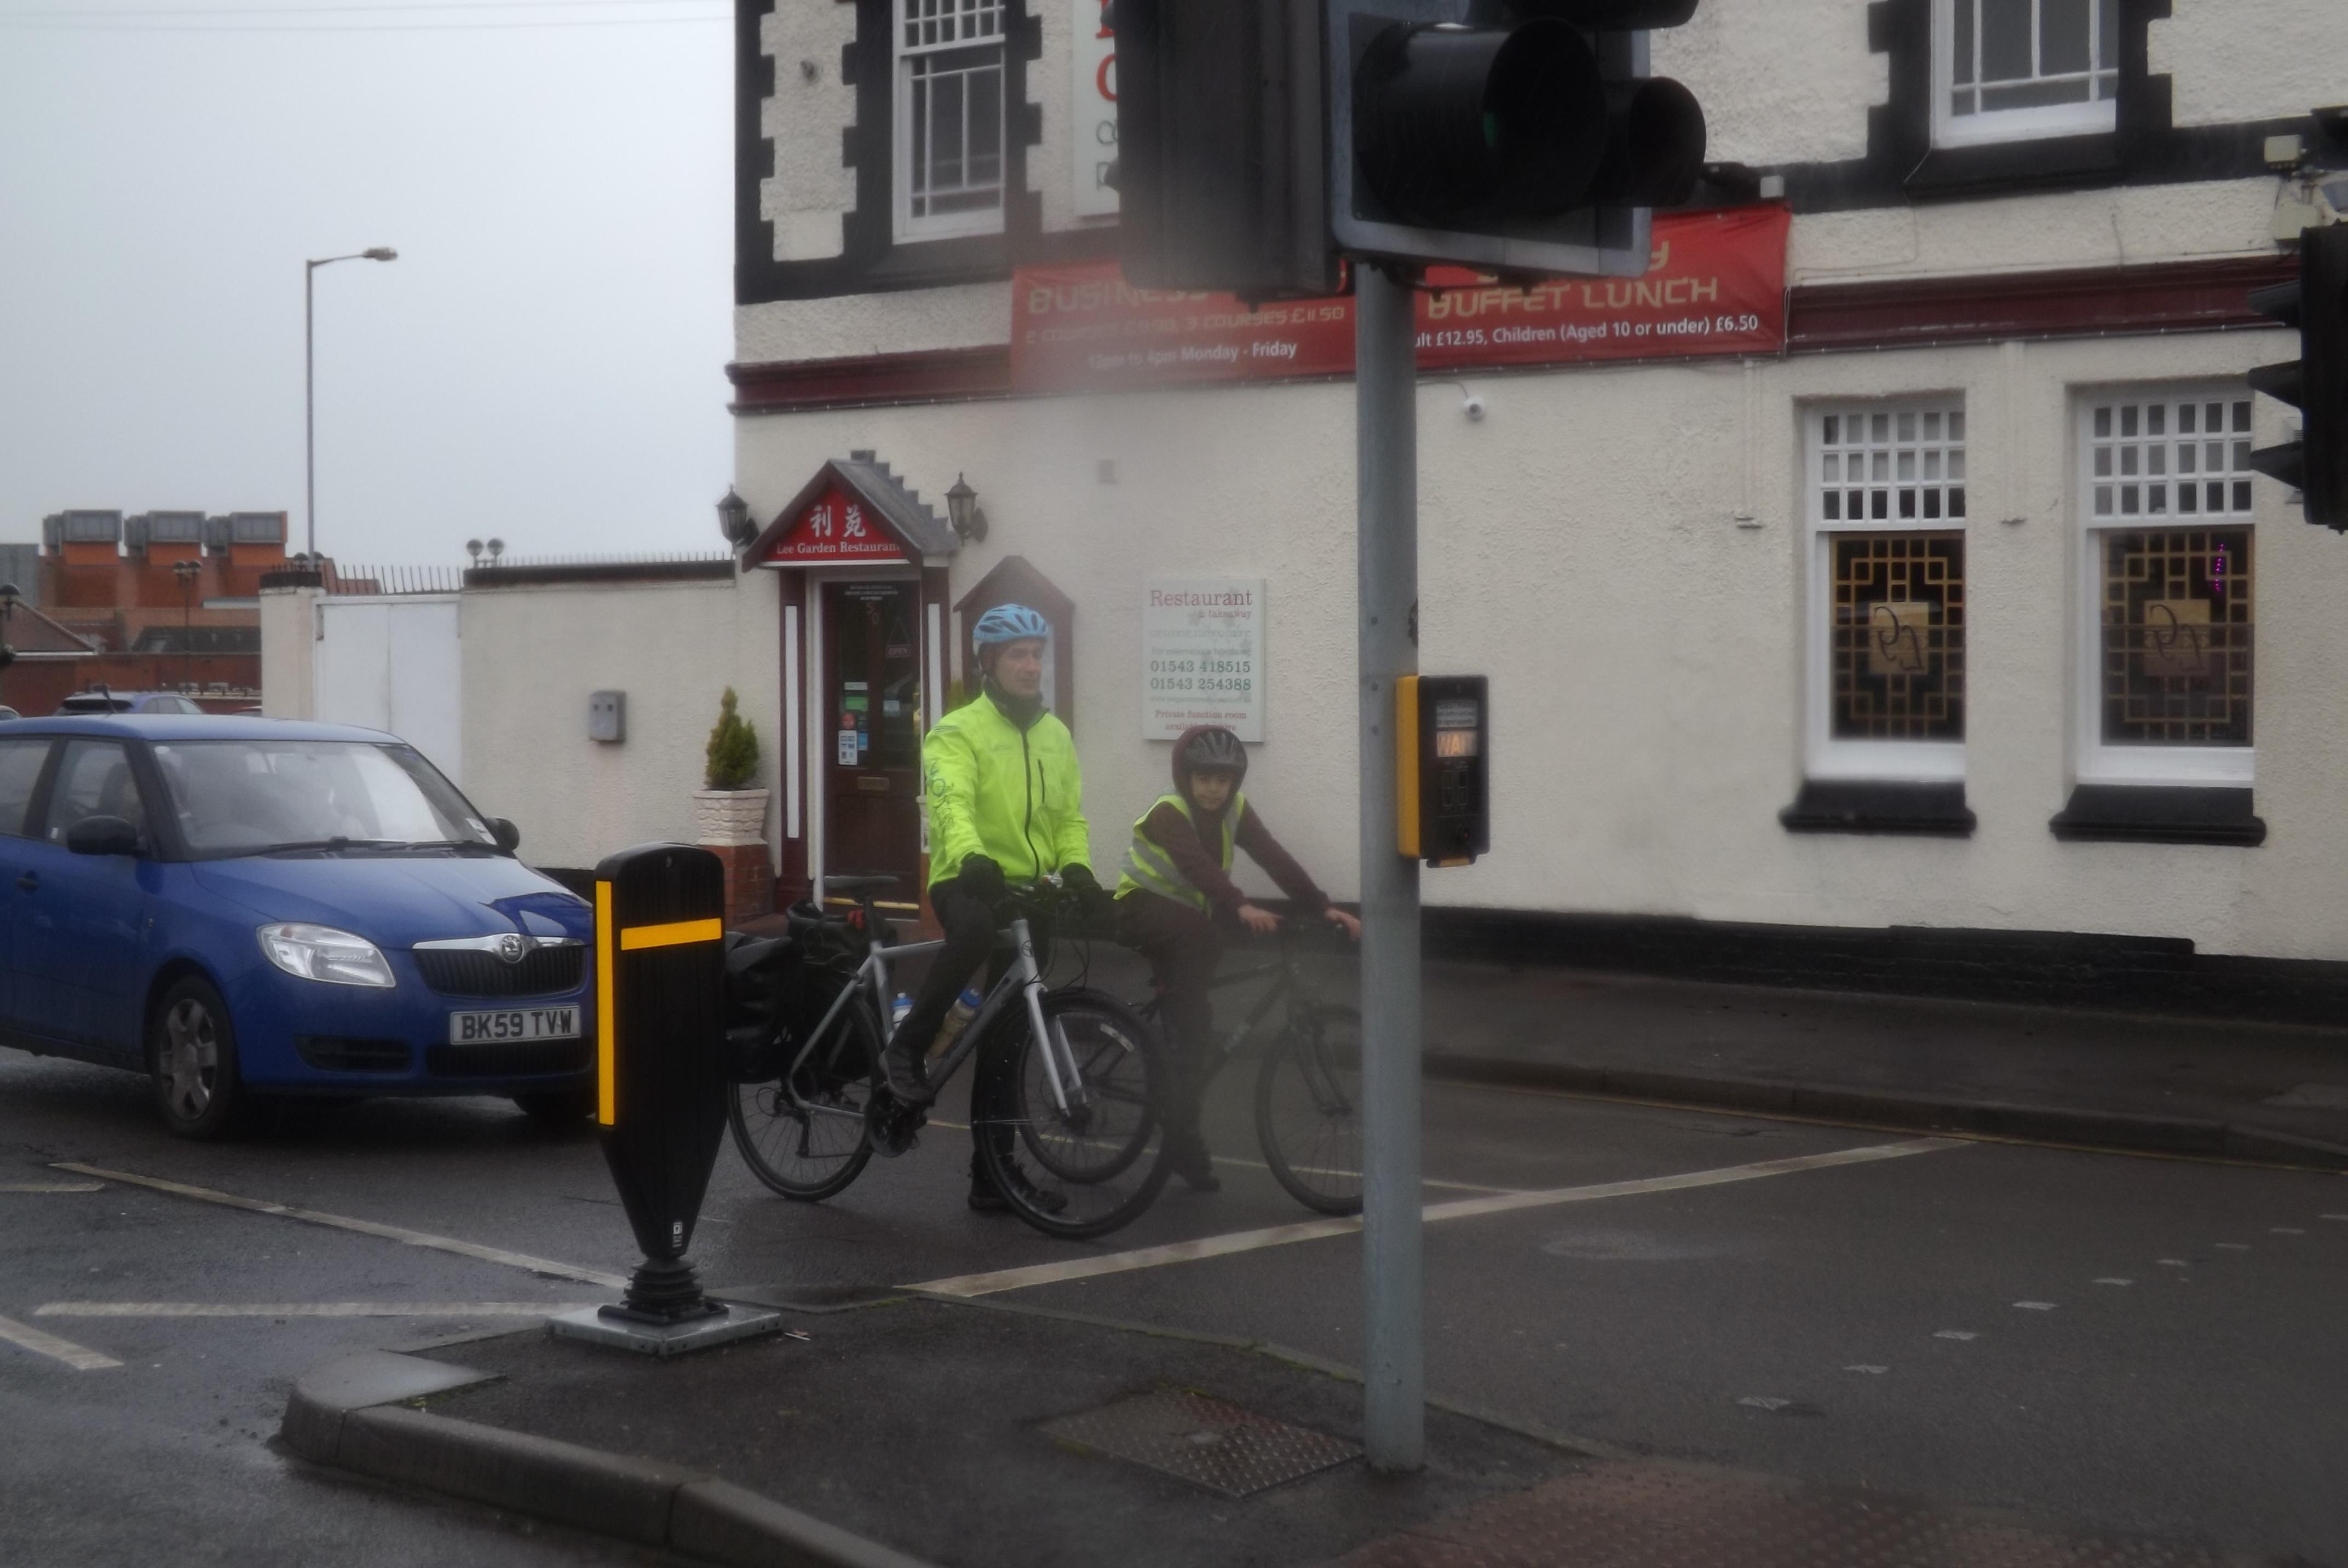 Copy of traffic lights